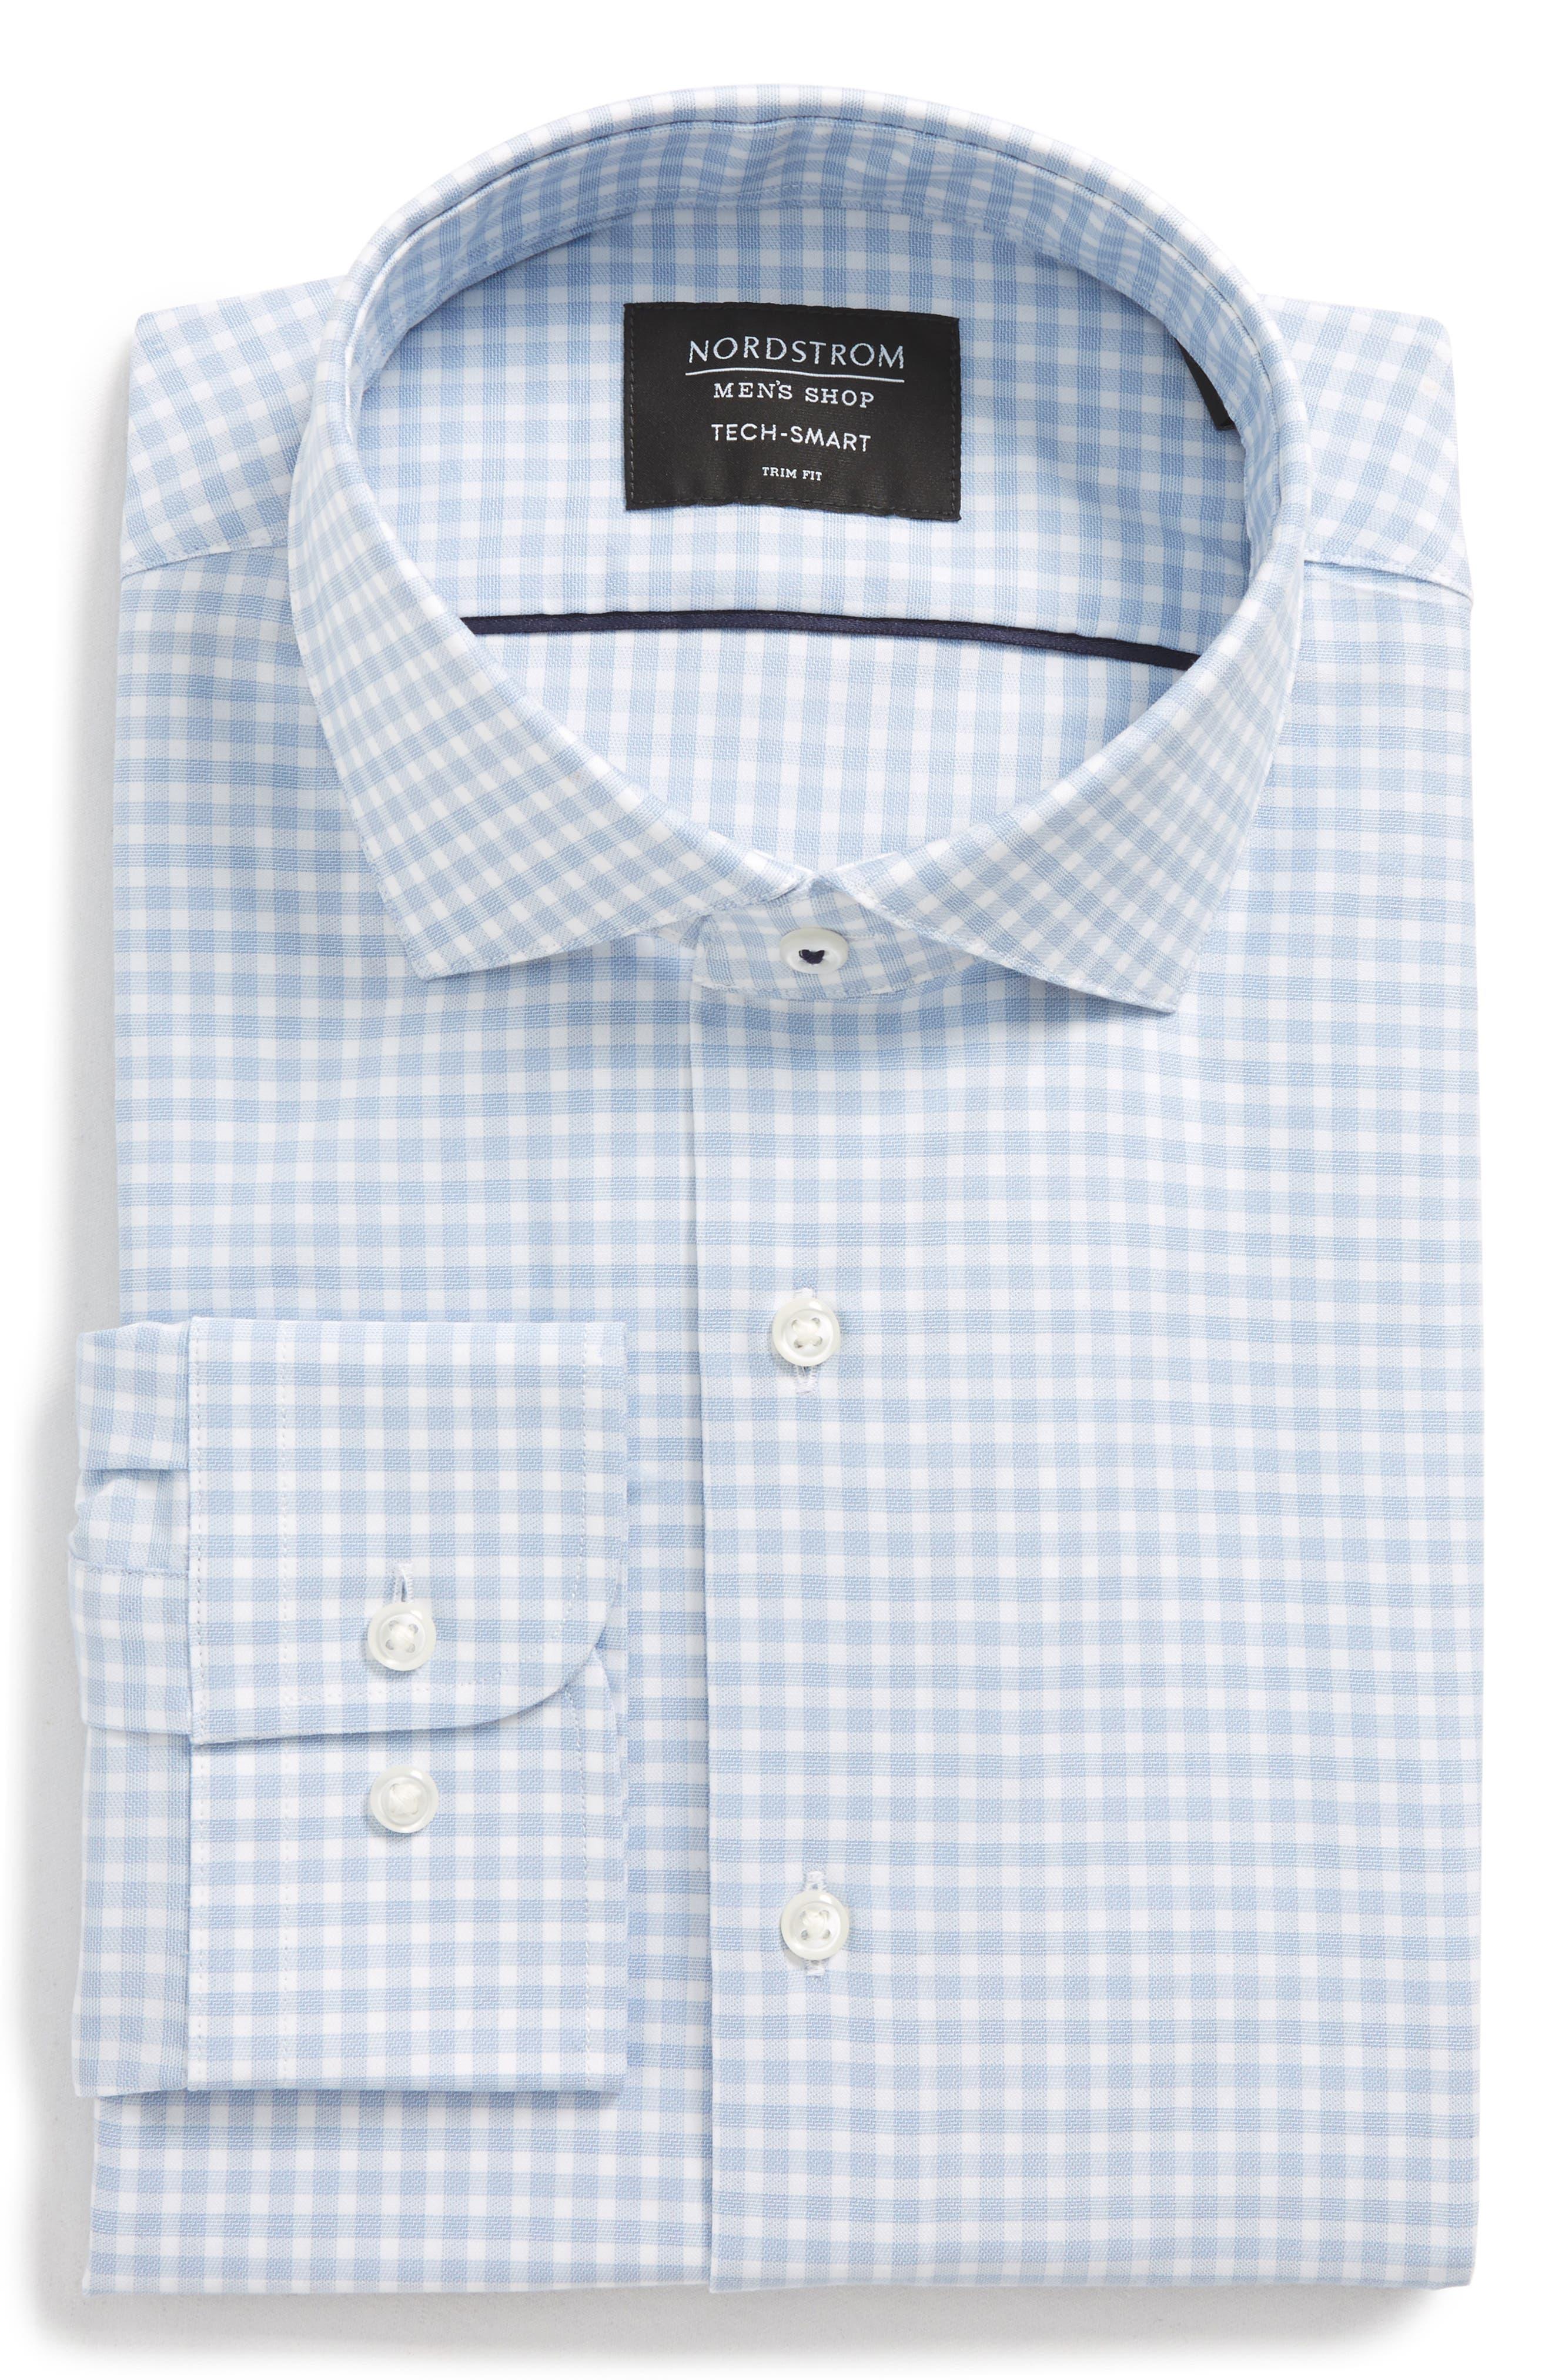 Nordstrom Men's Shop Tech-Smart Trim Fit Check Dress Shirt